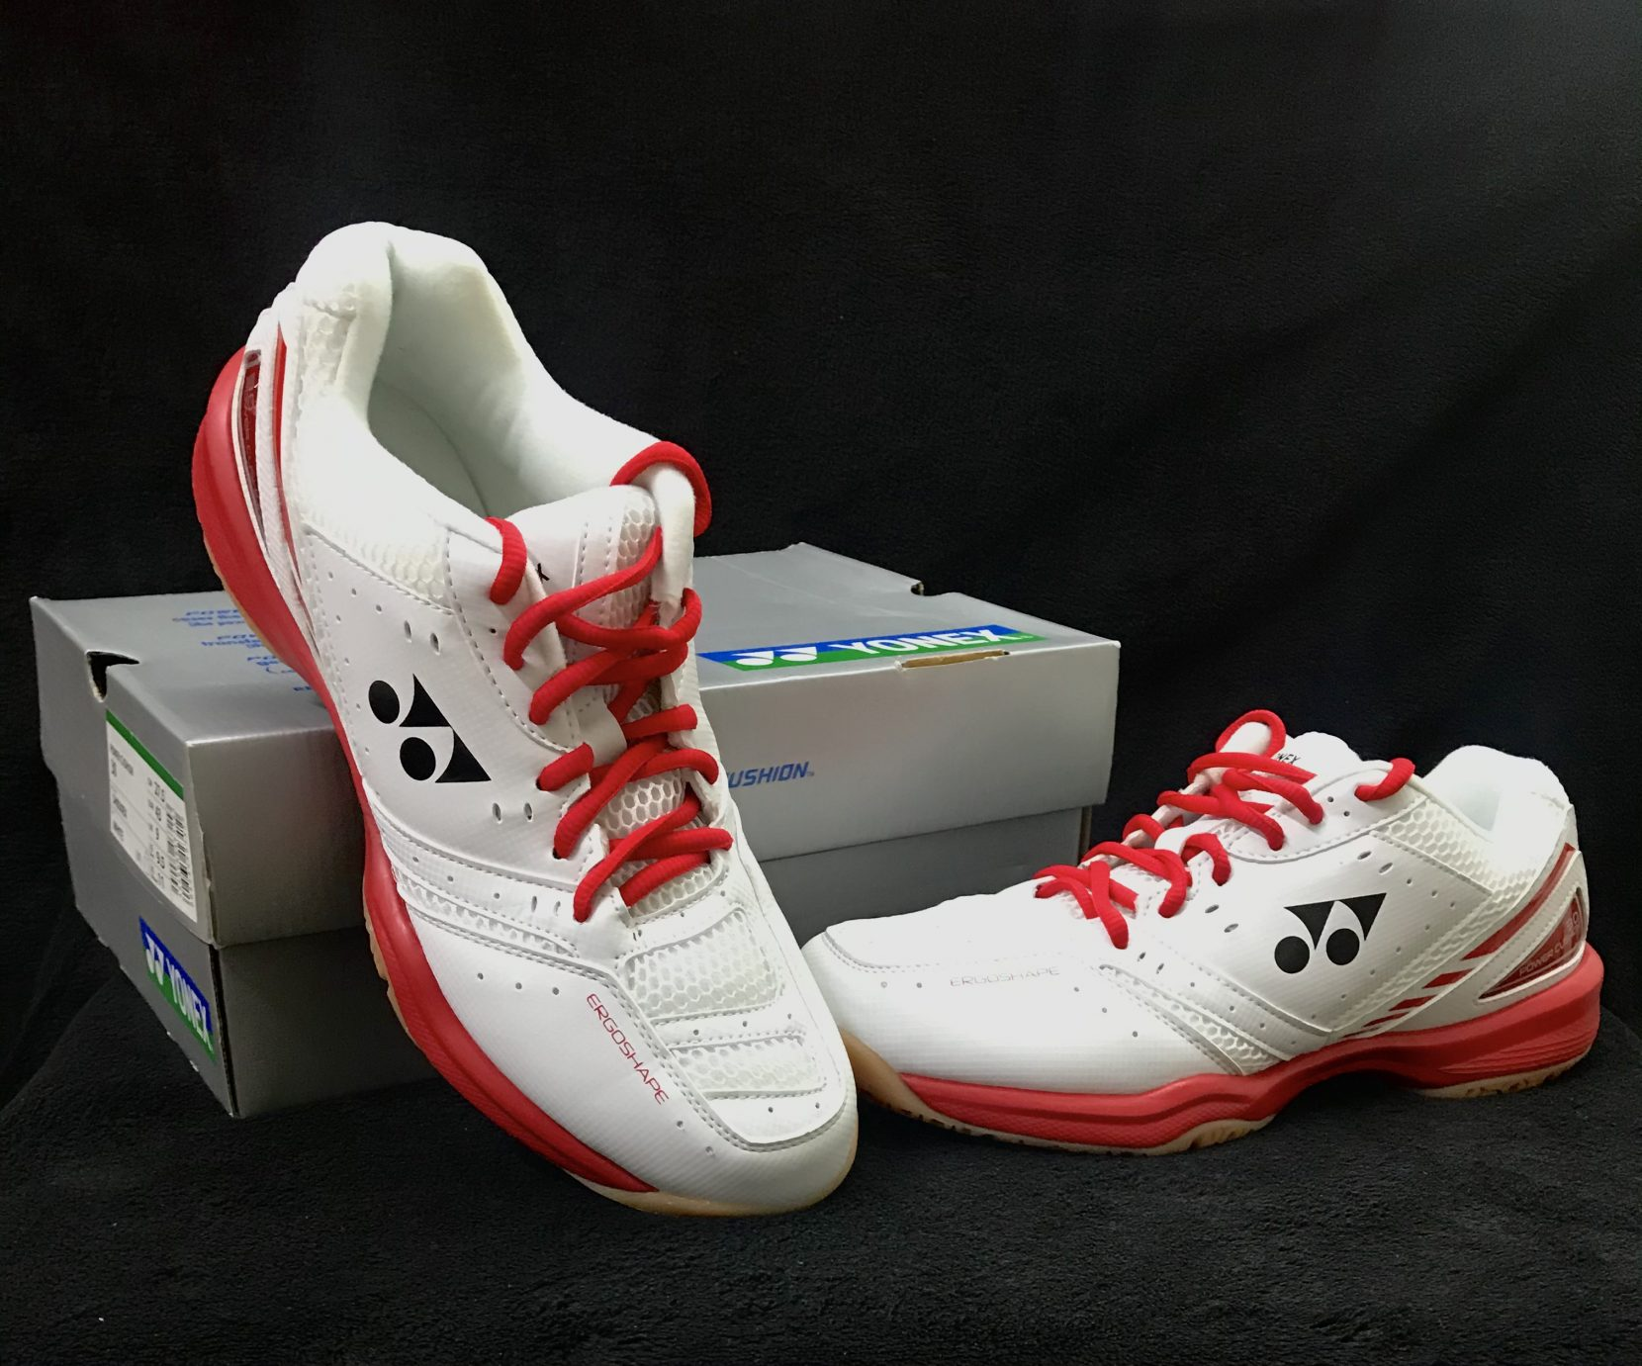 Yonex non marking shoes